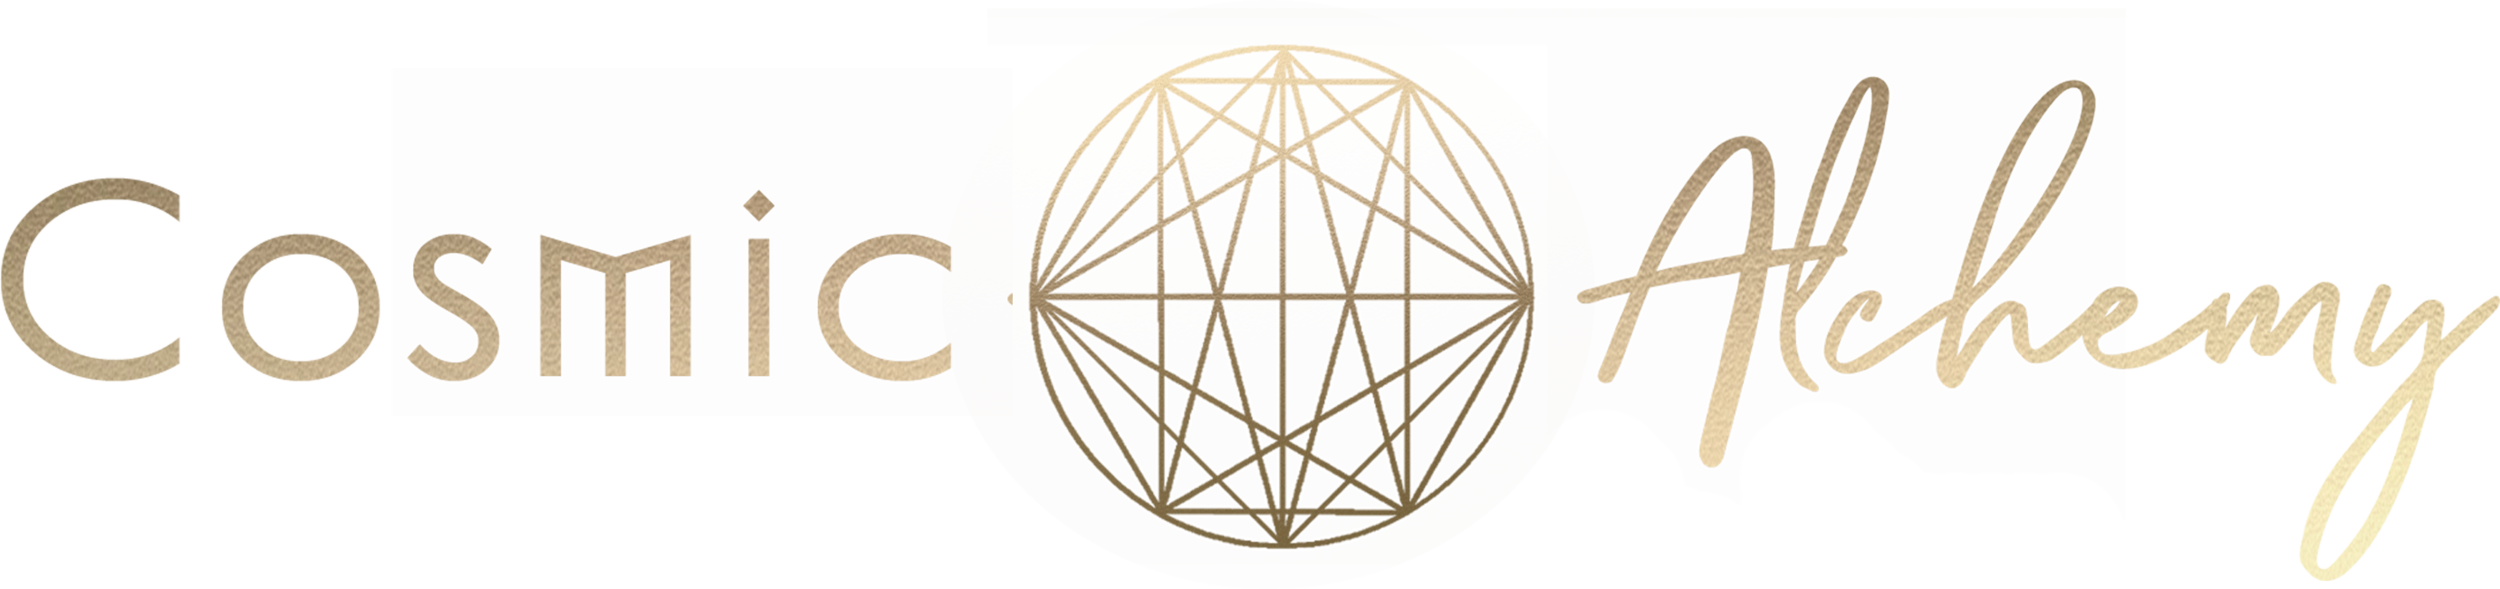 Cosmic Alchemy Logo New New.png